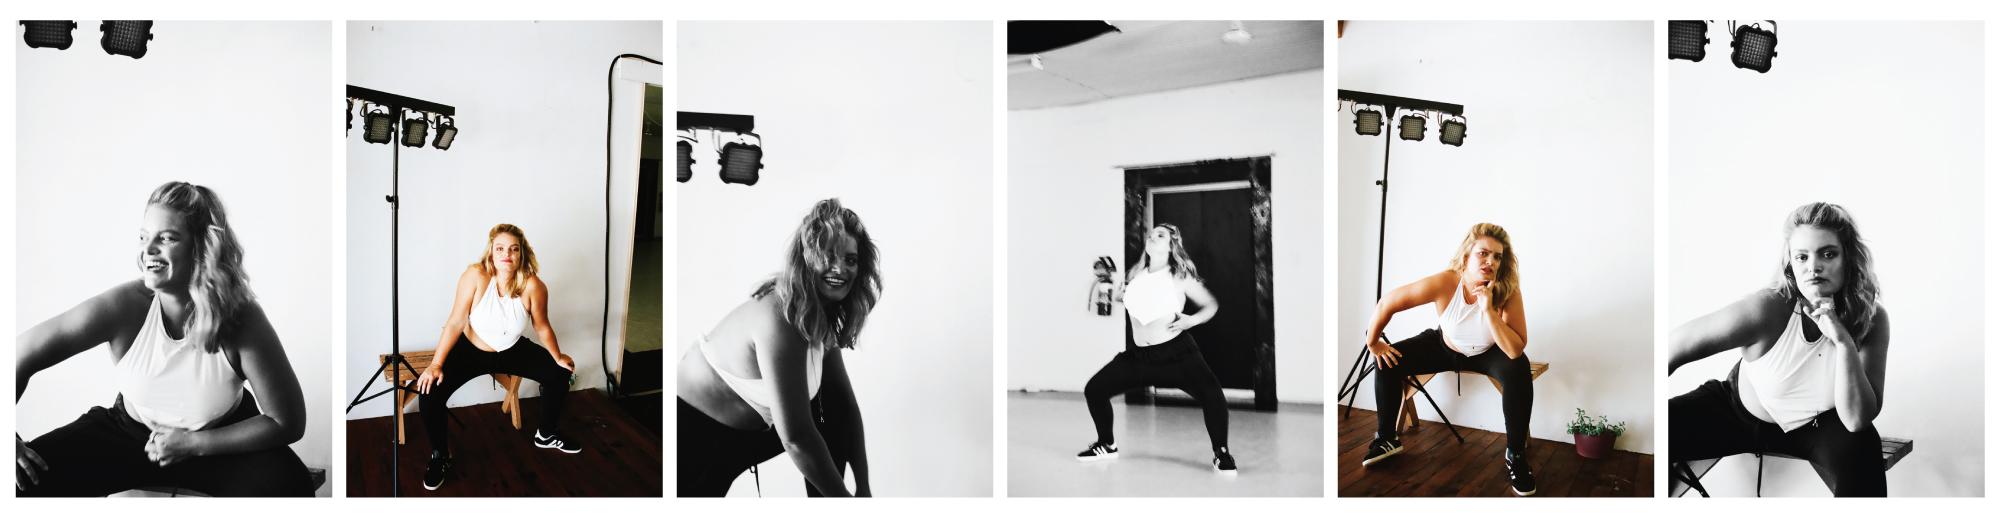 Kyla-Blacksmith-K-Dizzle-Hip-Hop-Jam-That's-My-Jam-Byron-Bay-by-Liar-the-Label-Dance-Studio.jpg